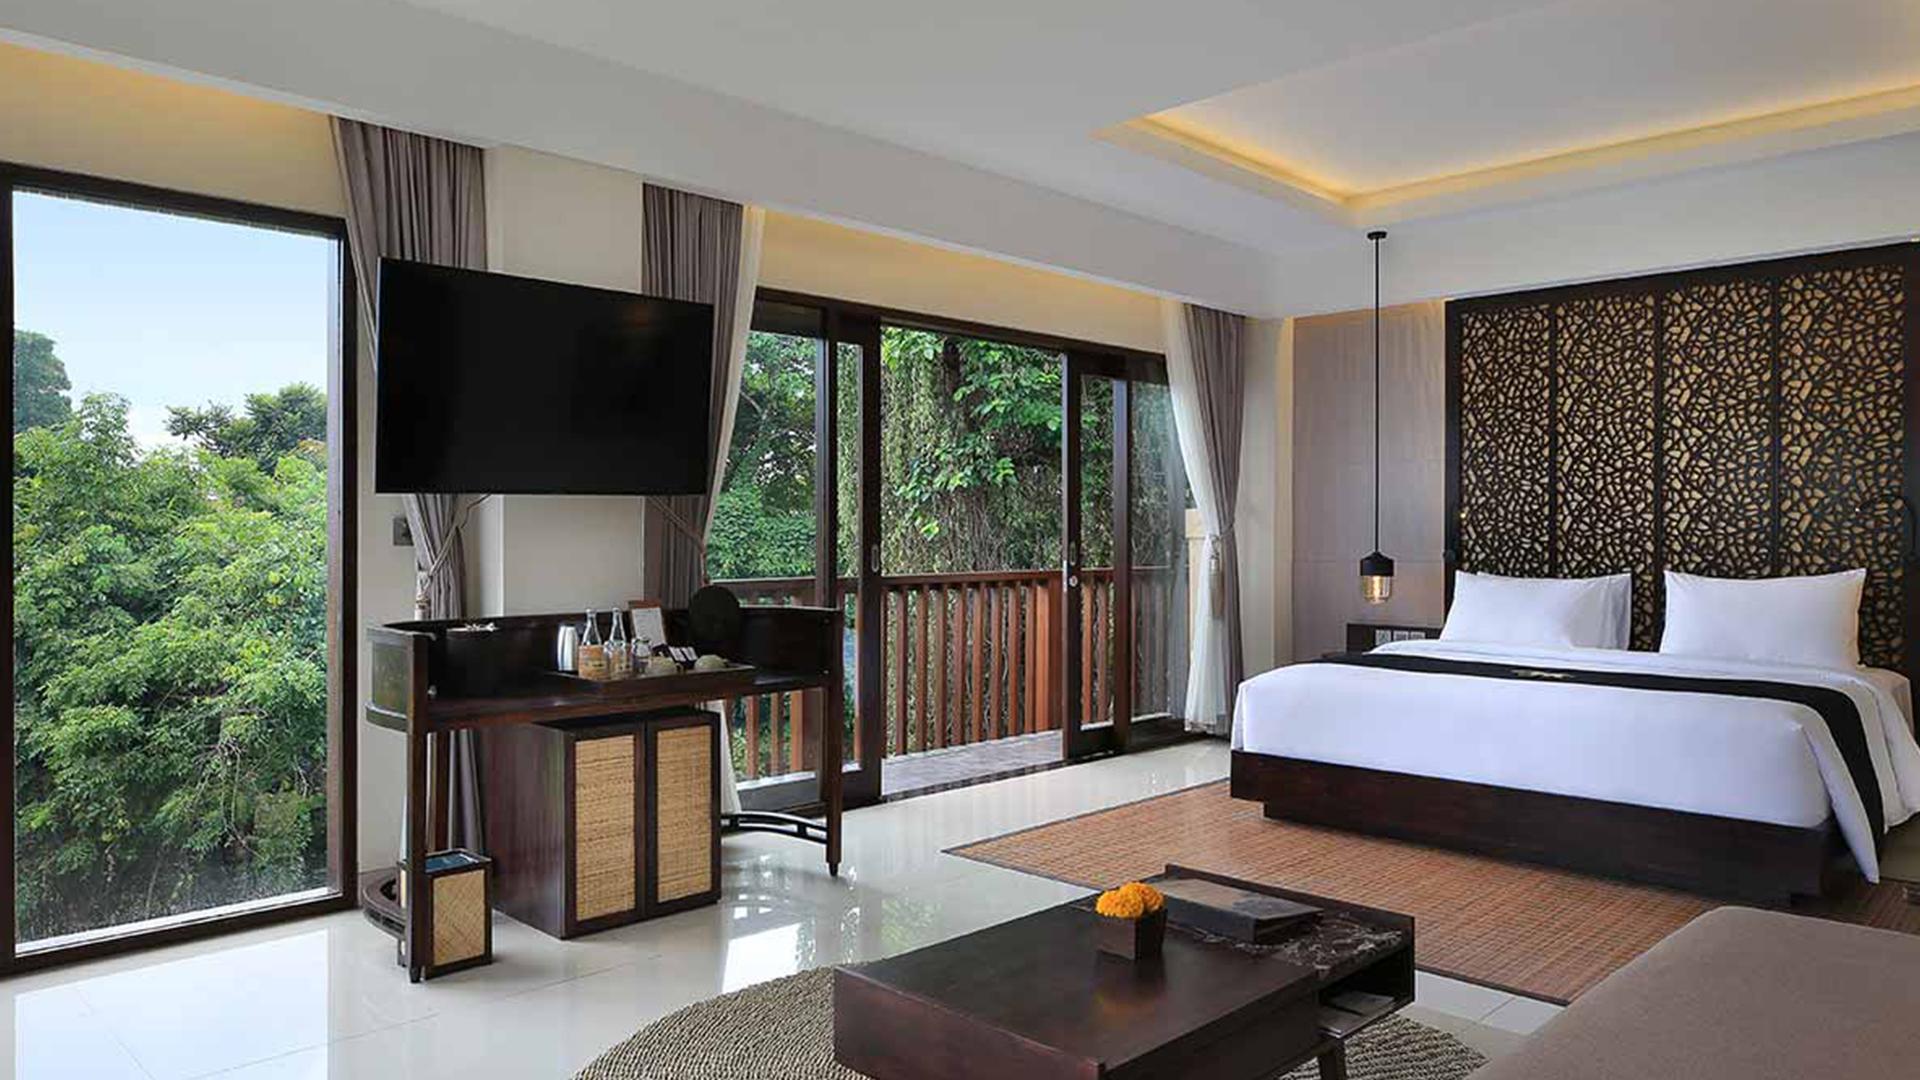 Sanctoo Suite  image 1 at Sanctoo Suites & Villas by Kabupaten Gianyar, Bali, Indonesia